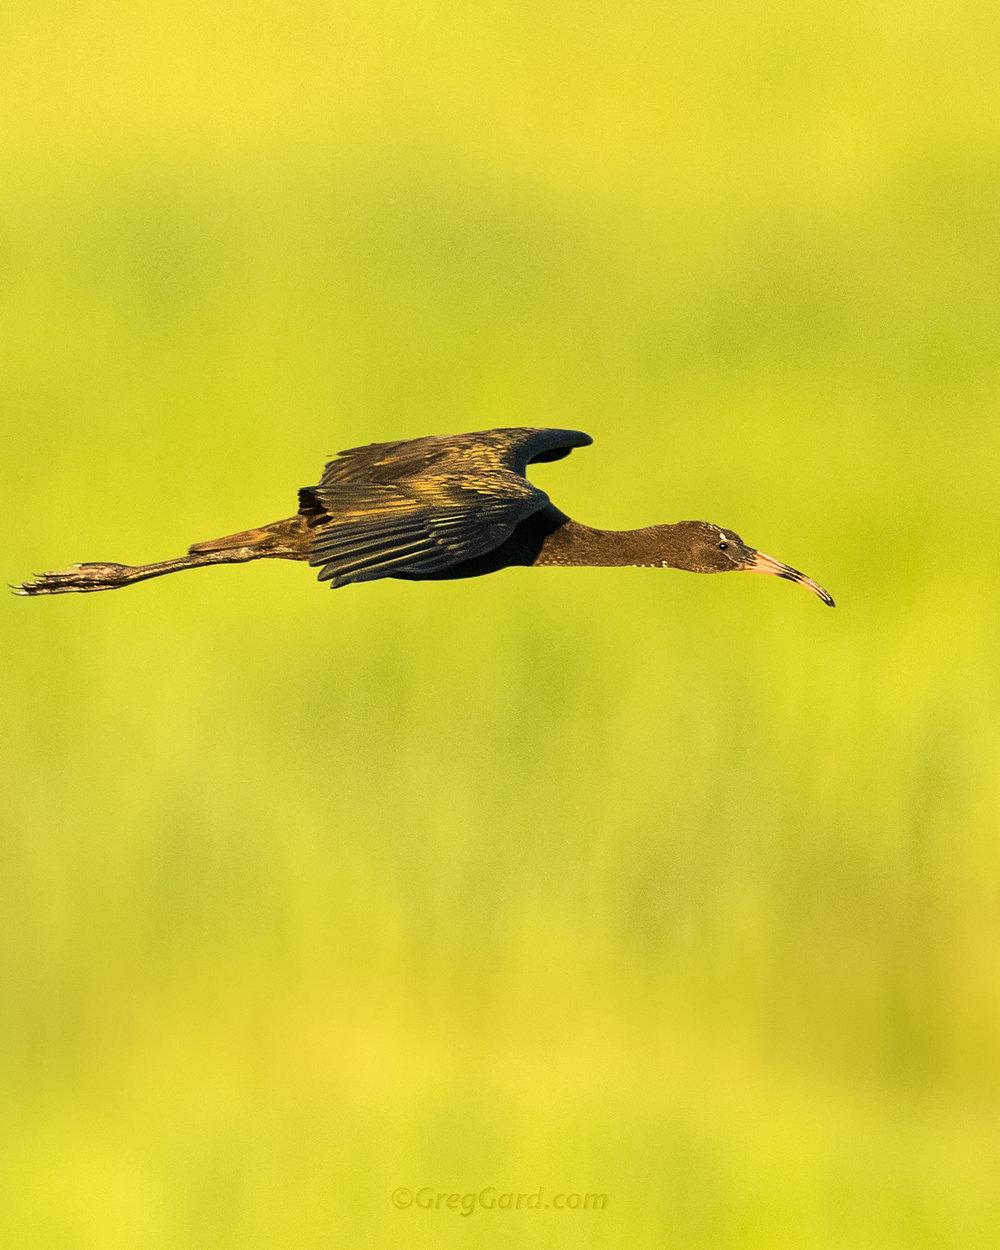 glossy-ibis-juvenile-flying-rookery-nj-bird-photography-greg-gard-878.jpg